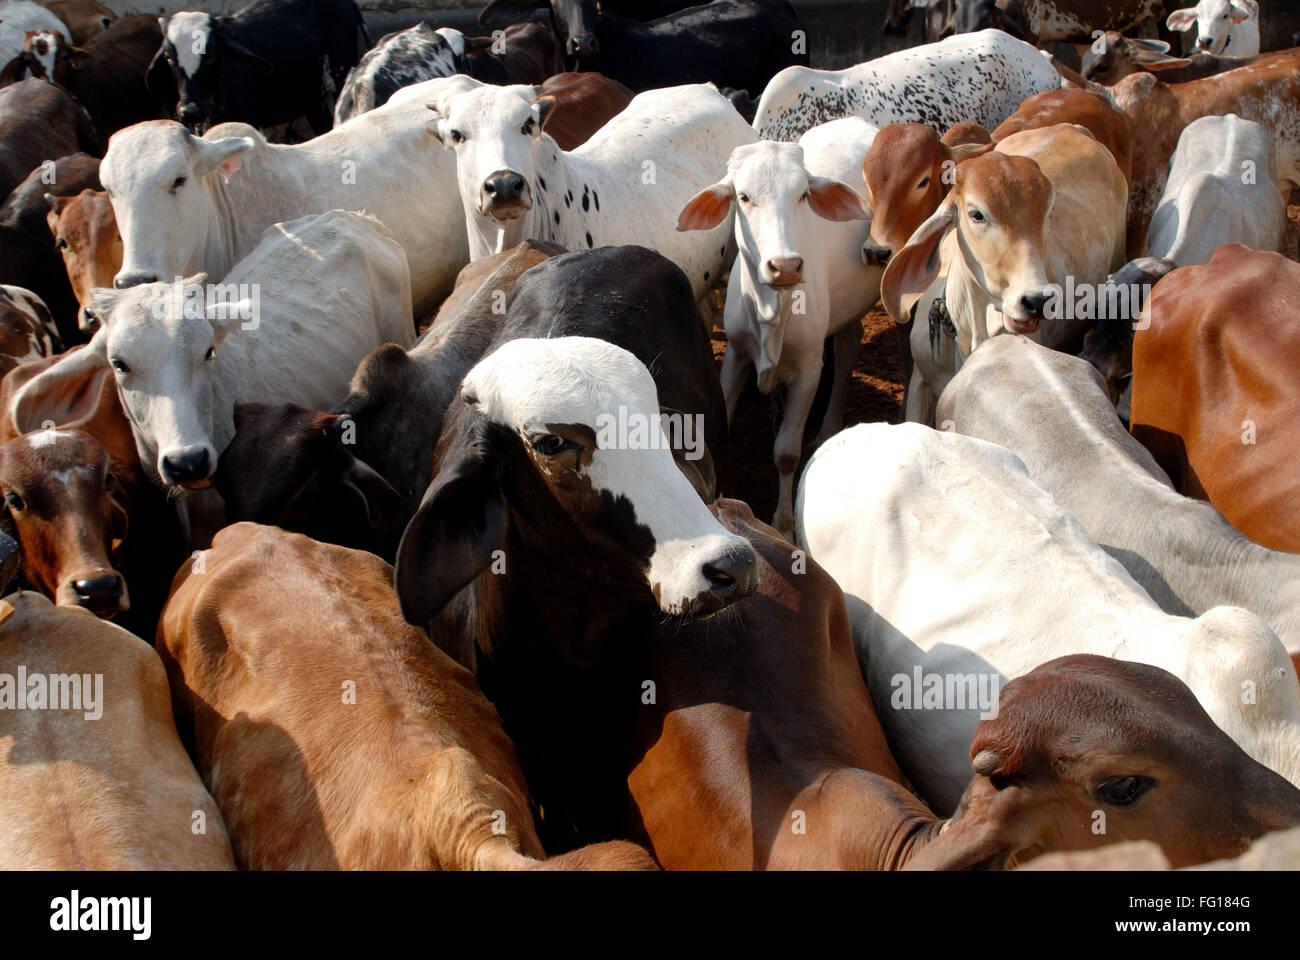 Les vaches indiennes , Animal , Inde Banque D'Images